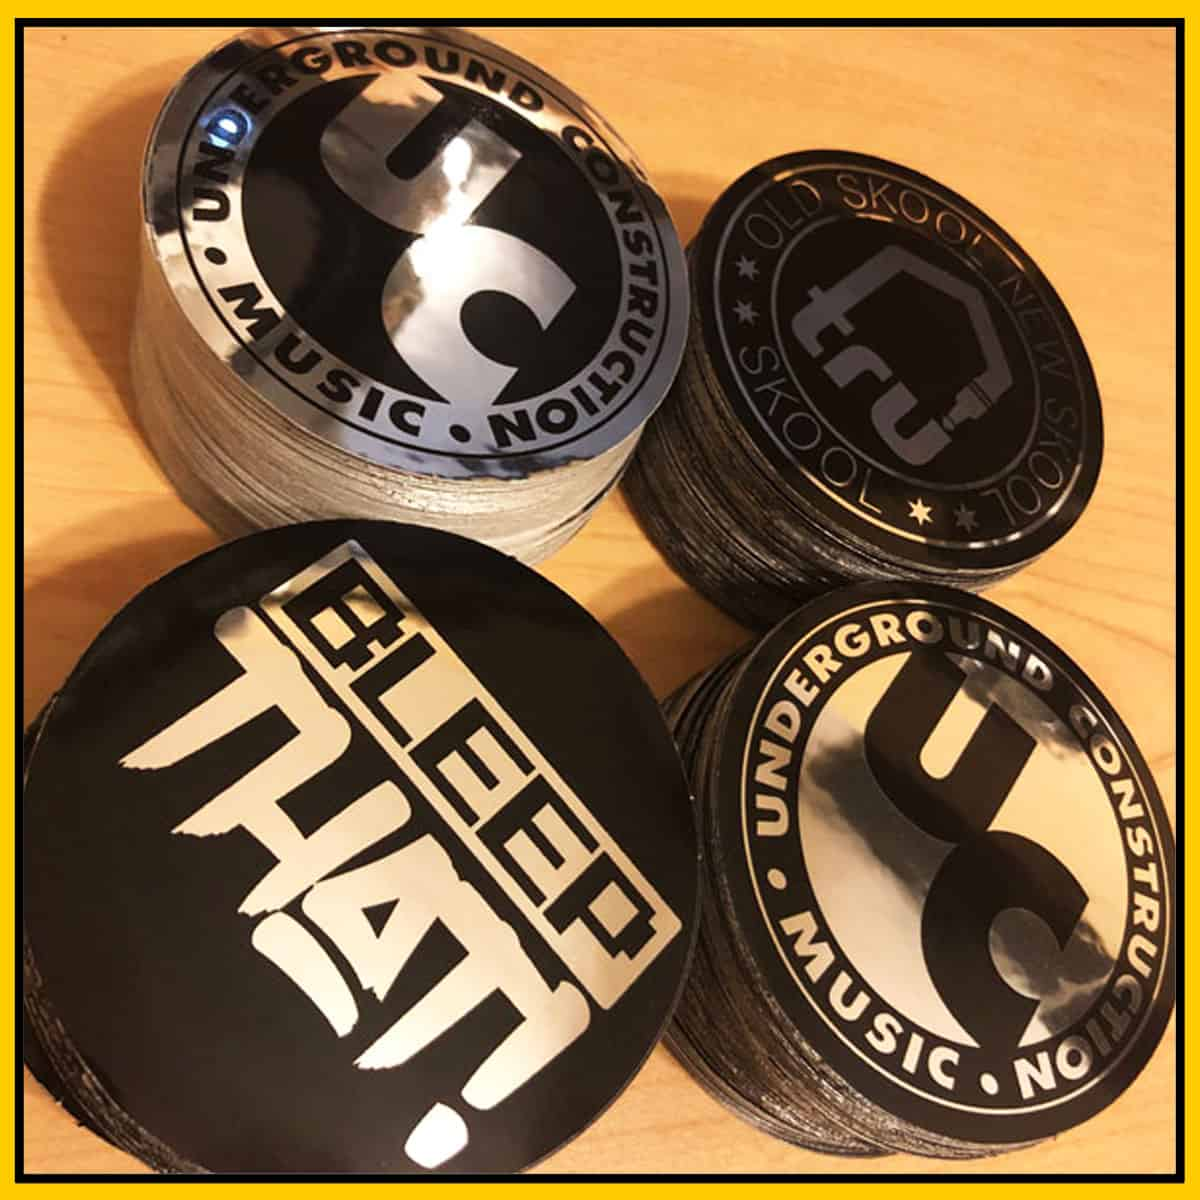 Tru Sticker Pack 2 – UC Icon, Bleep That, Tru Skool